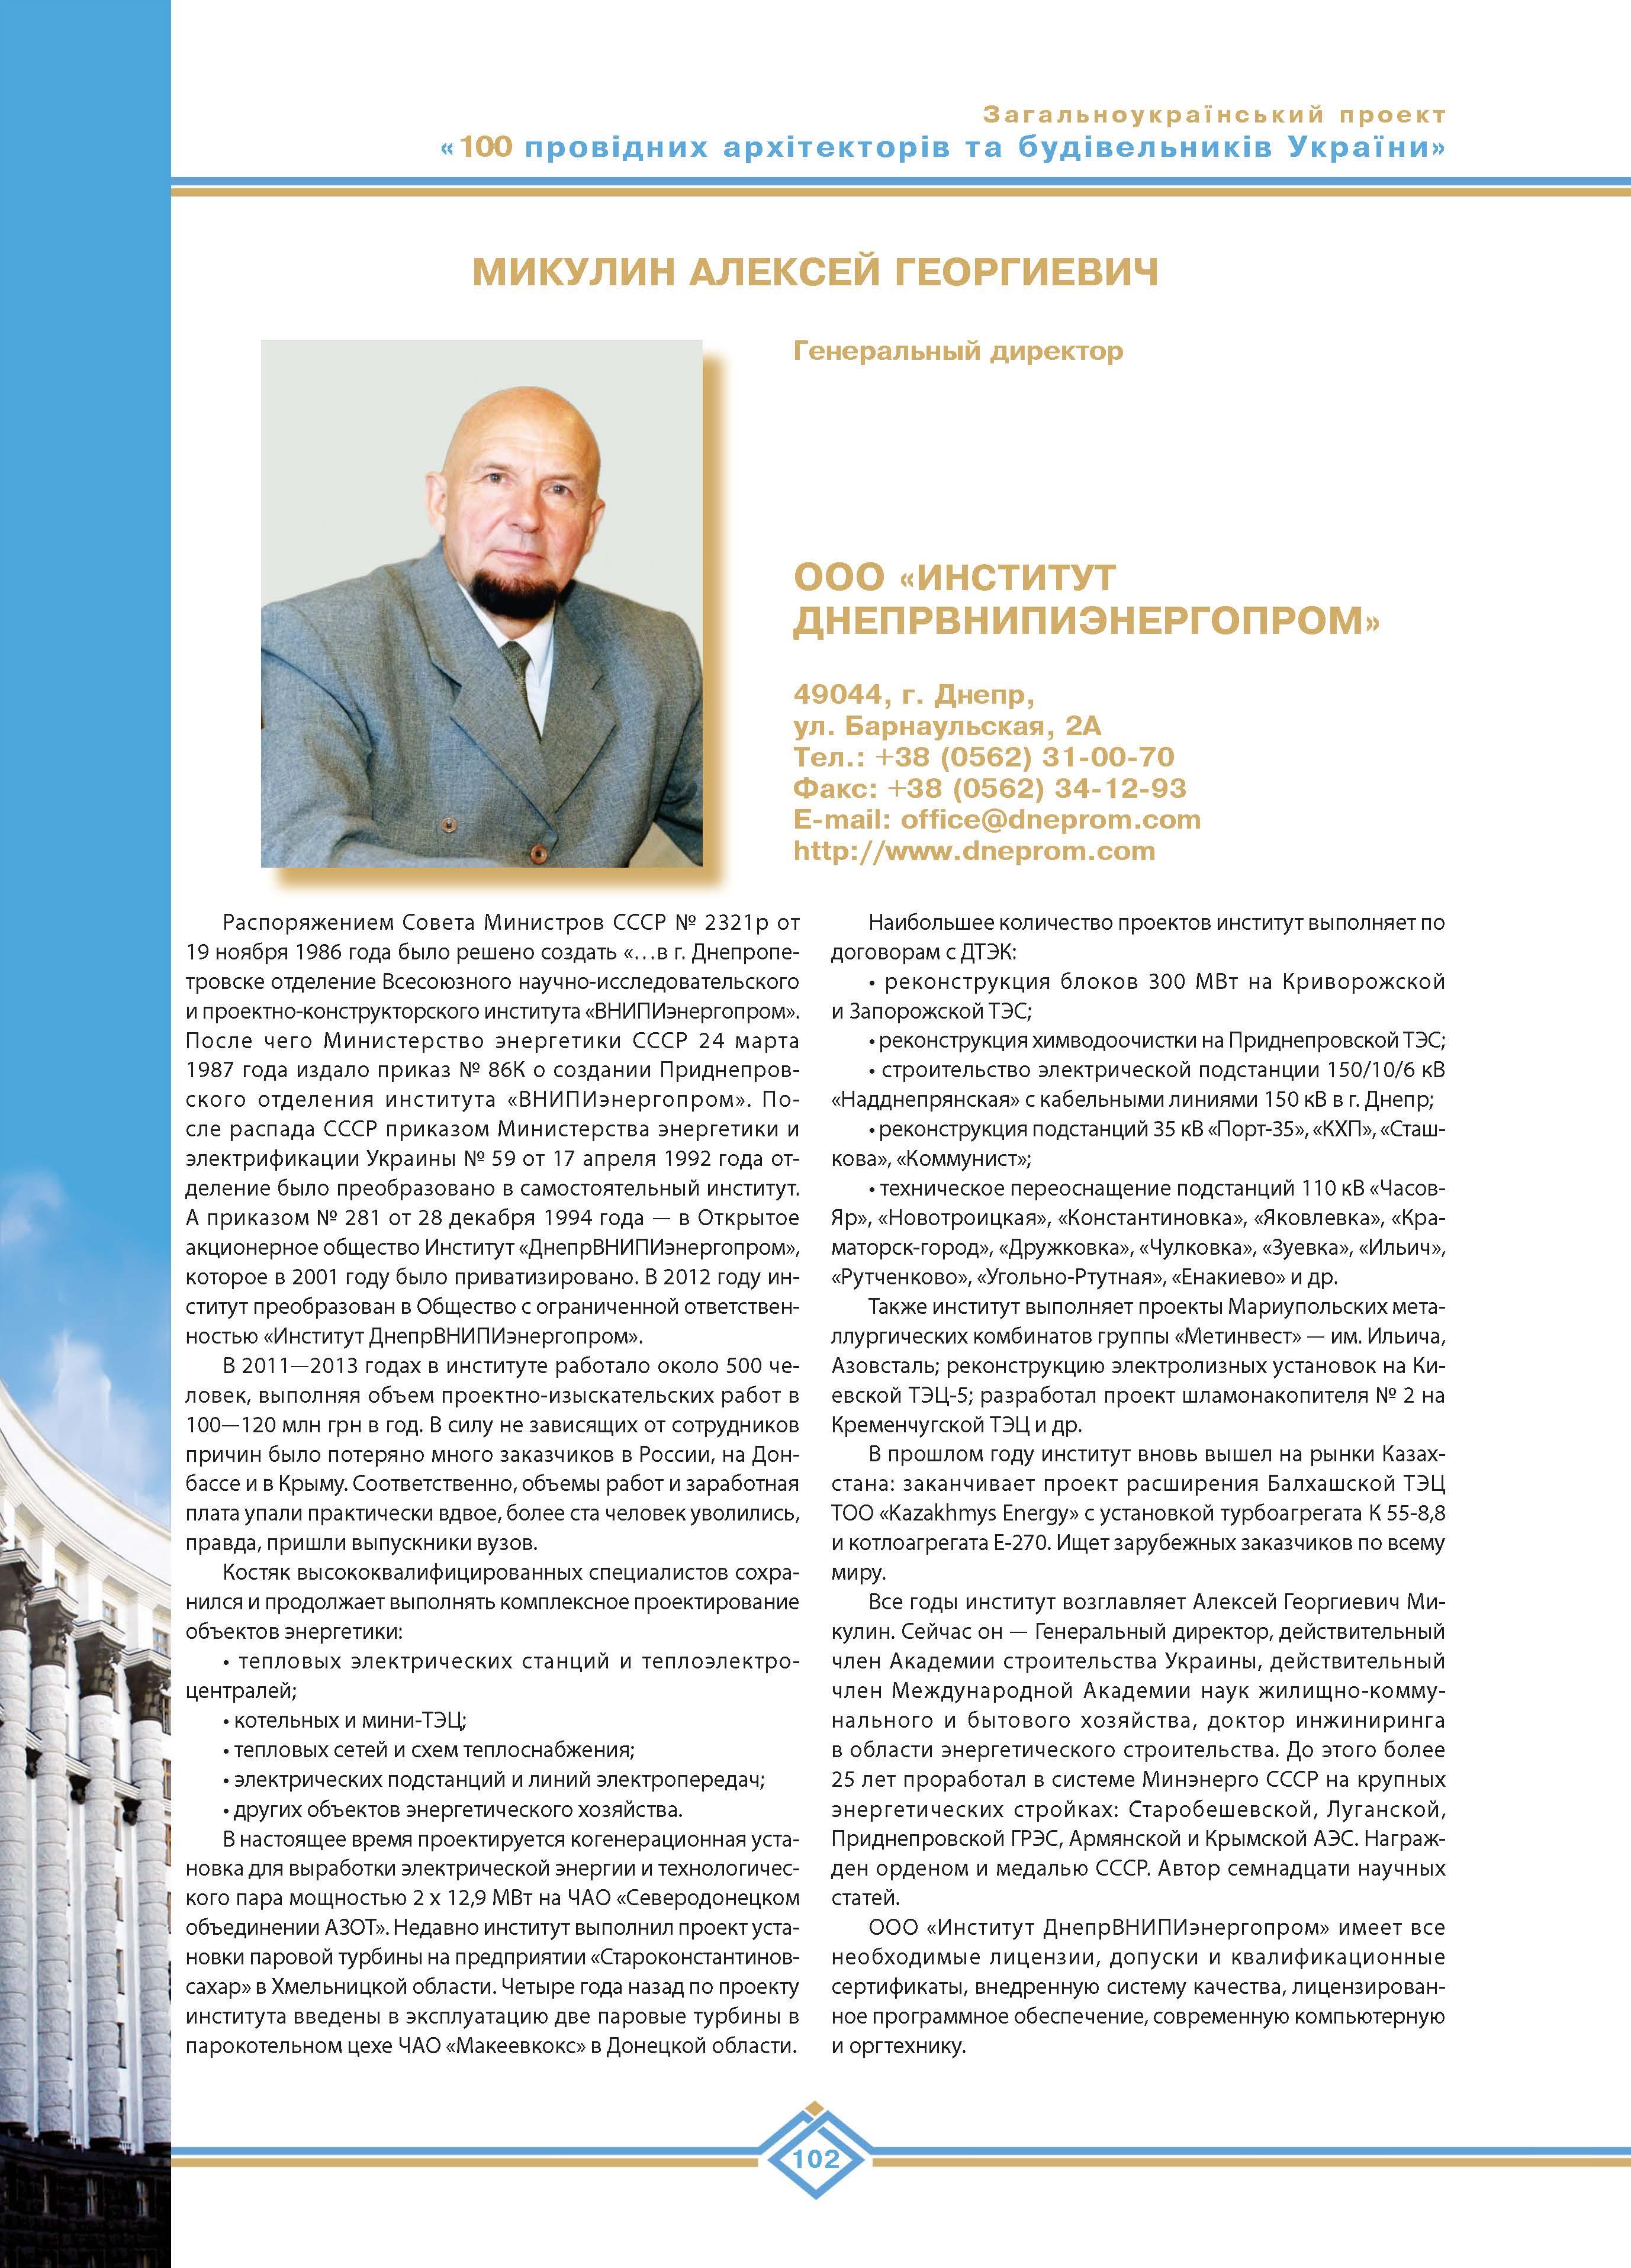 Микулин Алексей Георгиевич